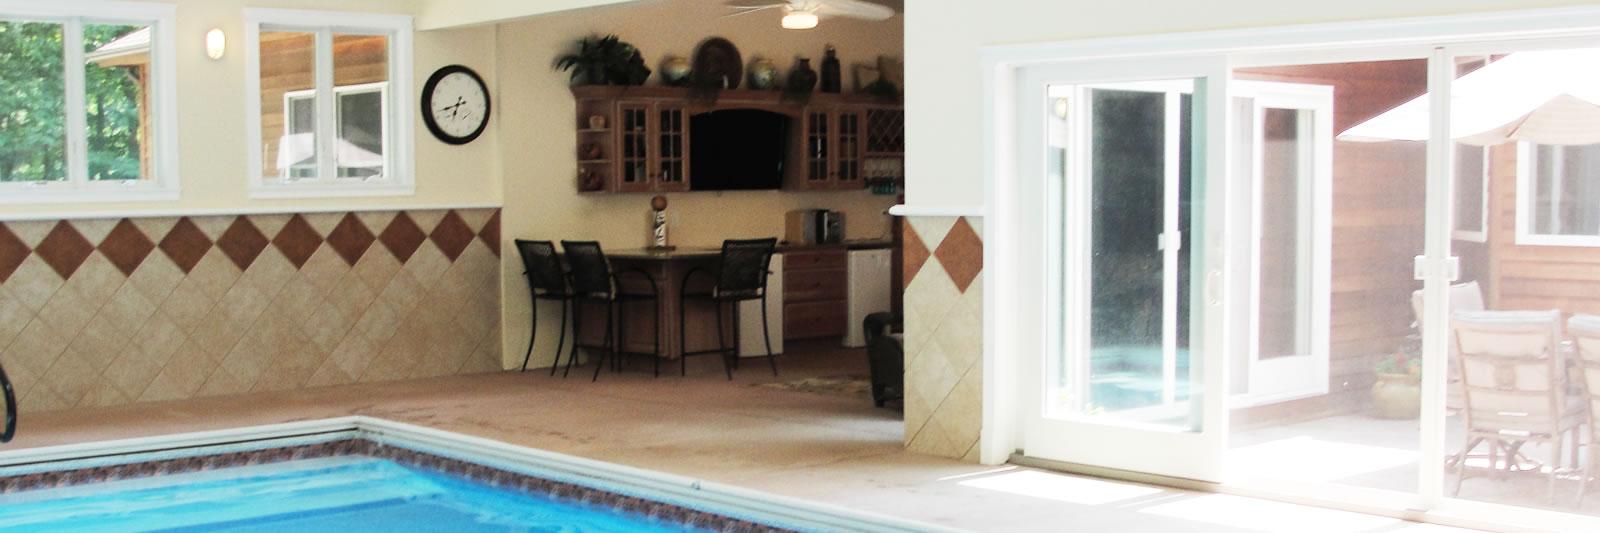 pool-house-remodeling-slideshow